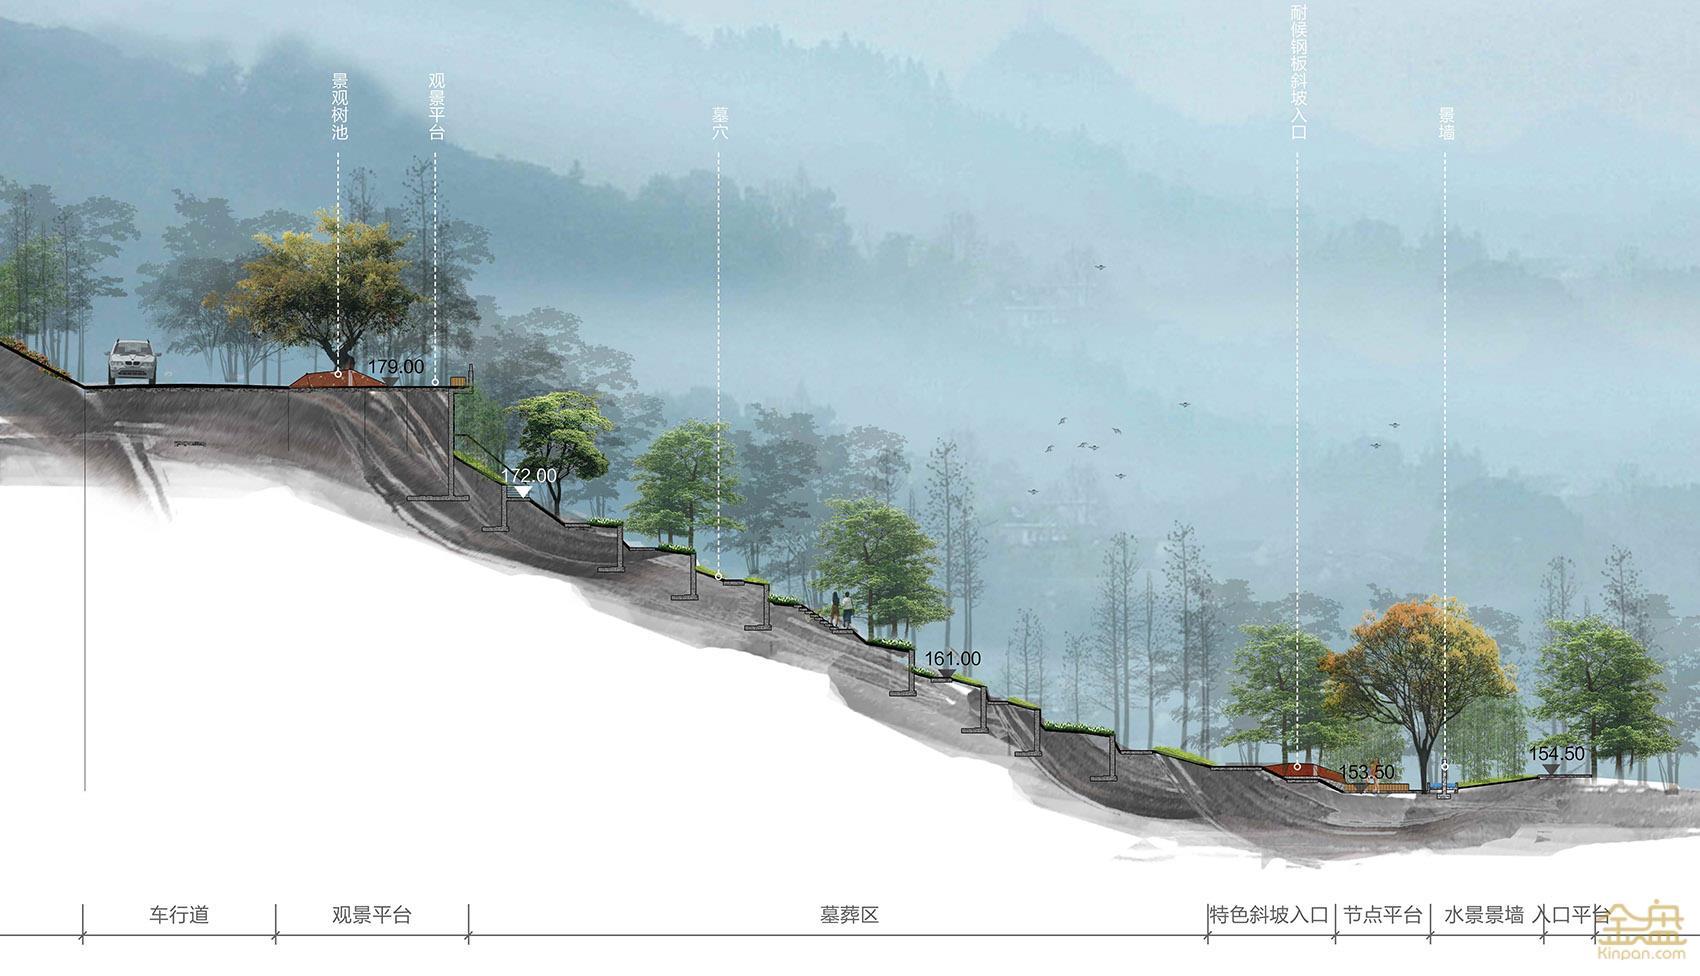 021-Taikang-Memorial-Park-section.jpg